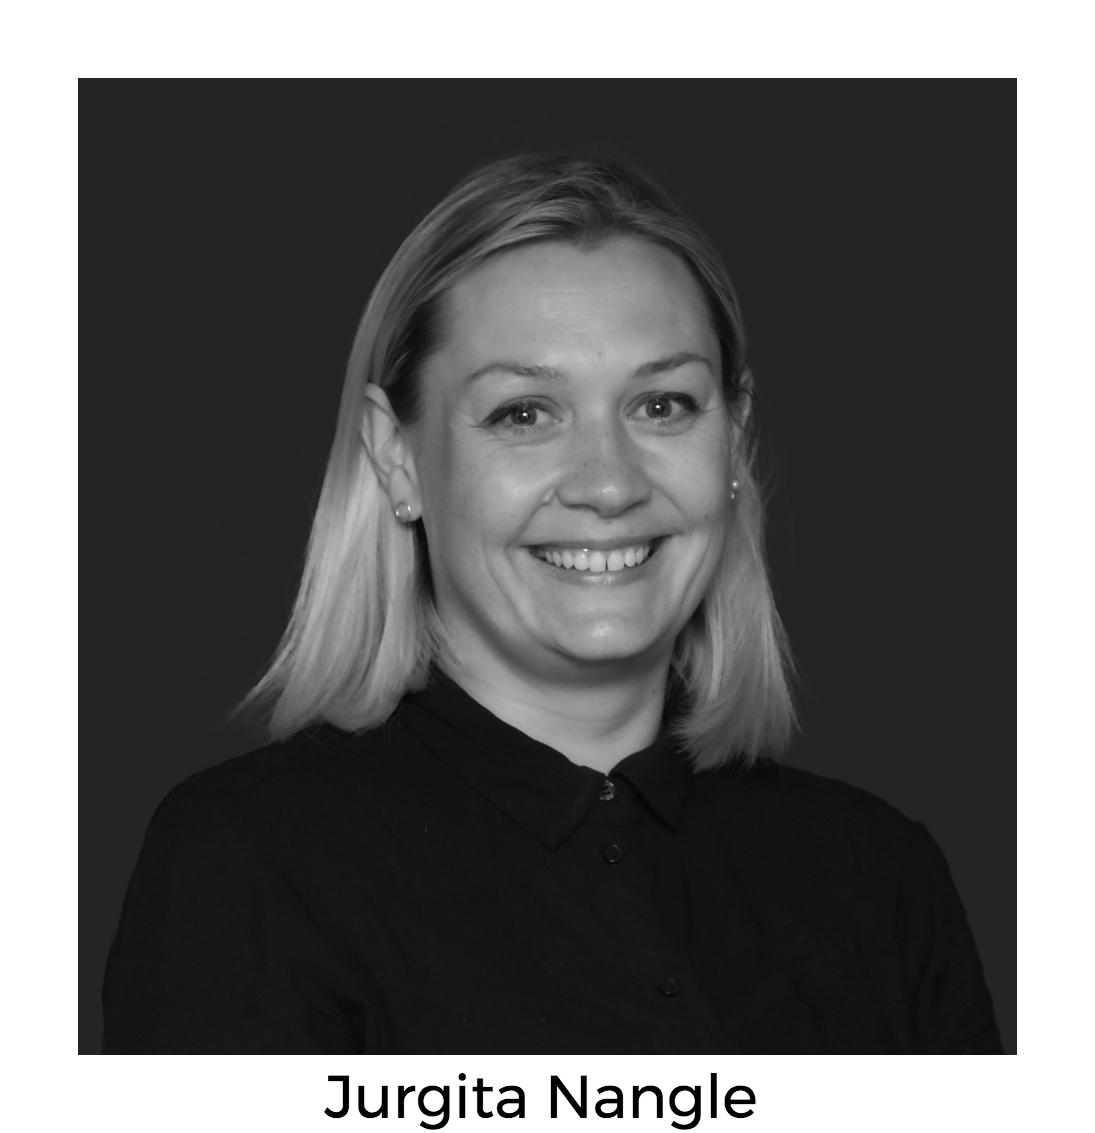 Jurgita Nangle